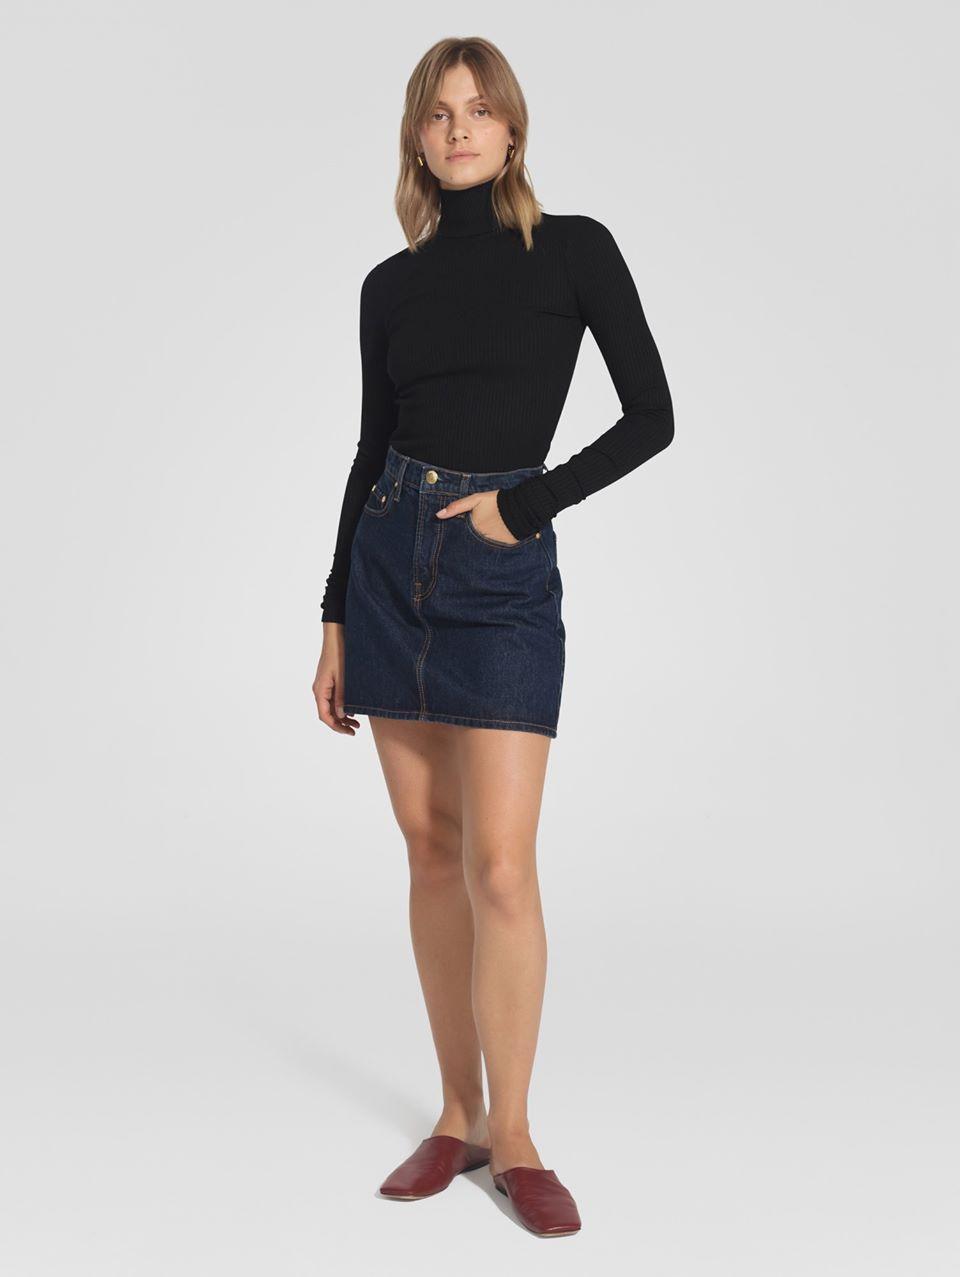 Piper Skirt Luna